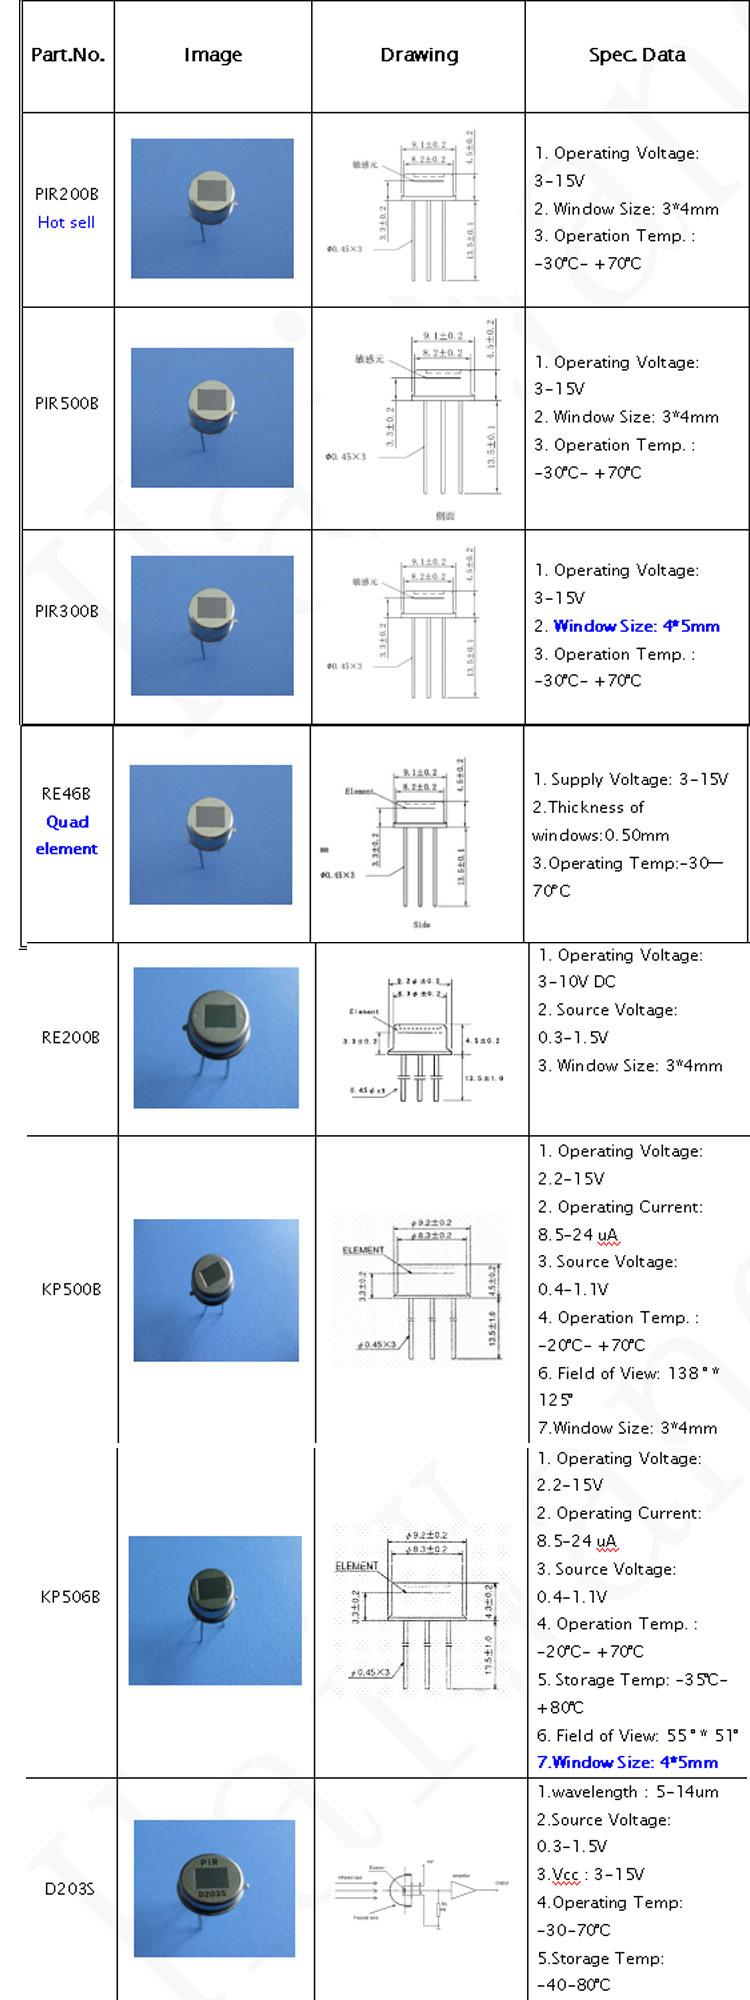 Lhi968 Pir Motion Sensor For Alarm Circuit China Sensors Using Integrated Pyroelectric Series Your Choice